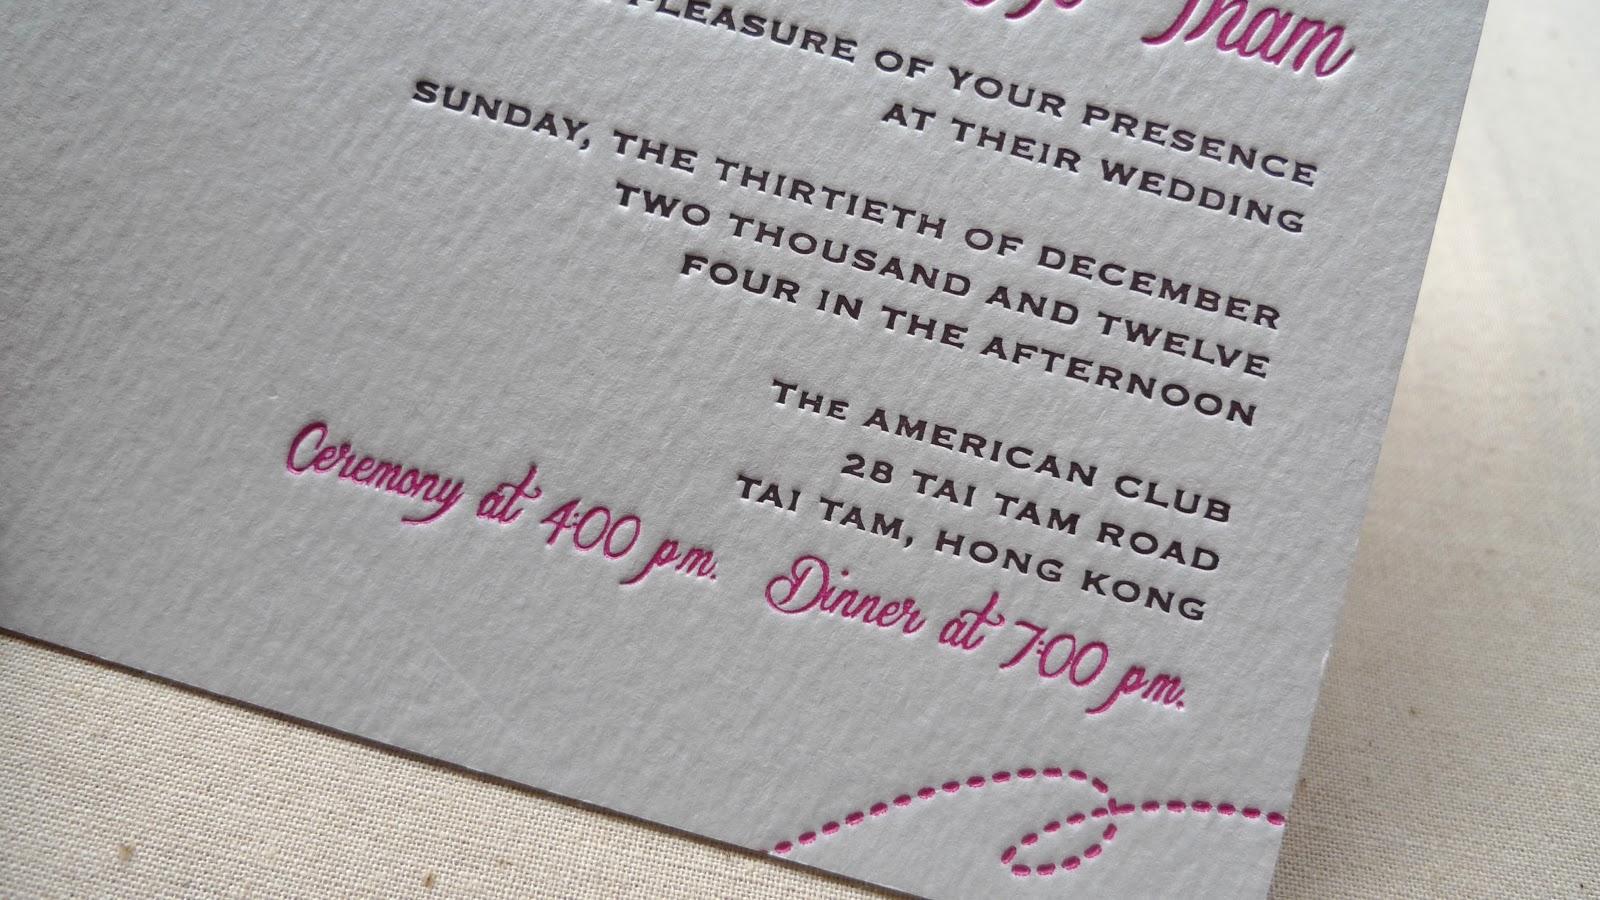 Kalo make art bespoke wedding invitation designs fly with us kalo make art bespoke wedding invitation designs fly with us bespoke wedding invitation design hong kong kristyandbryce Images